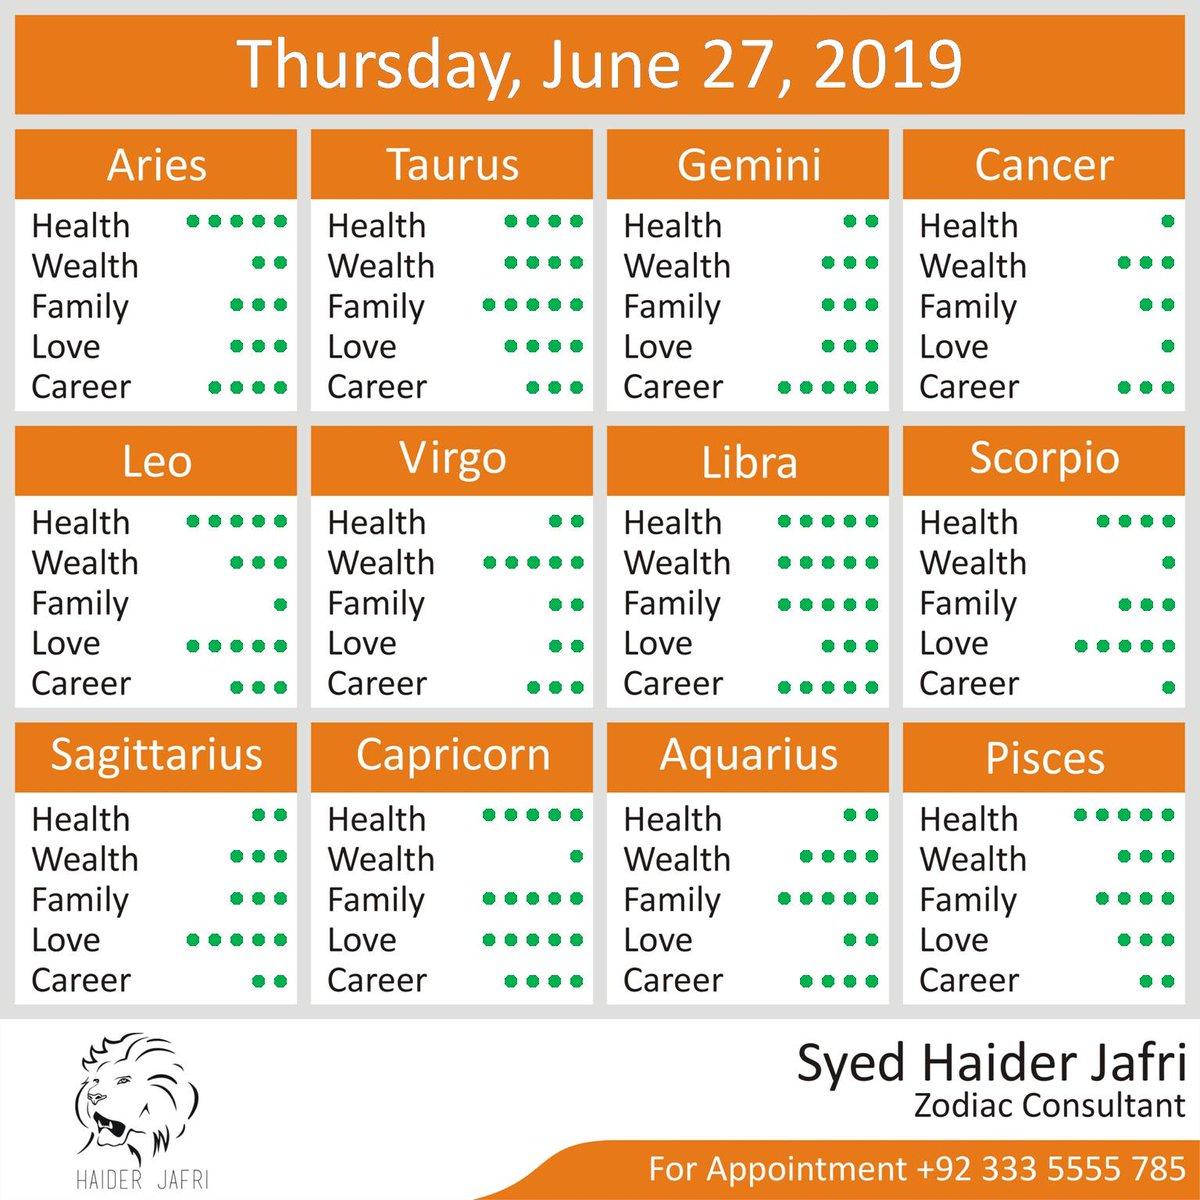 Syed Haider Jafri on Twitter: